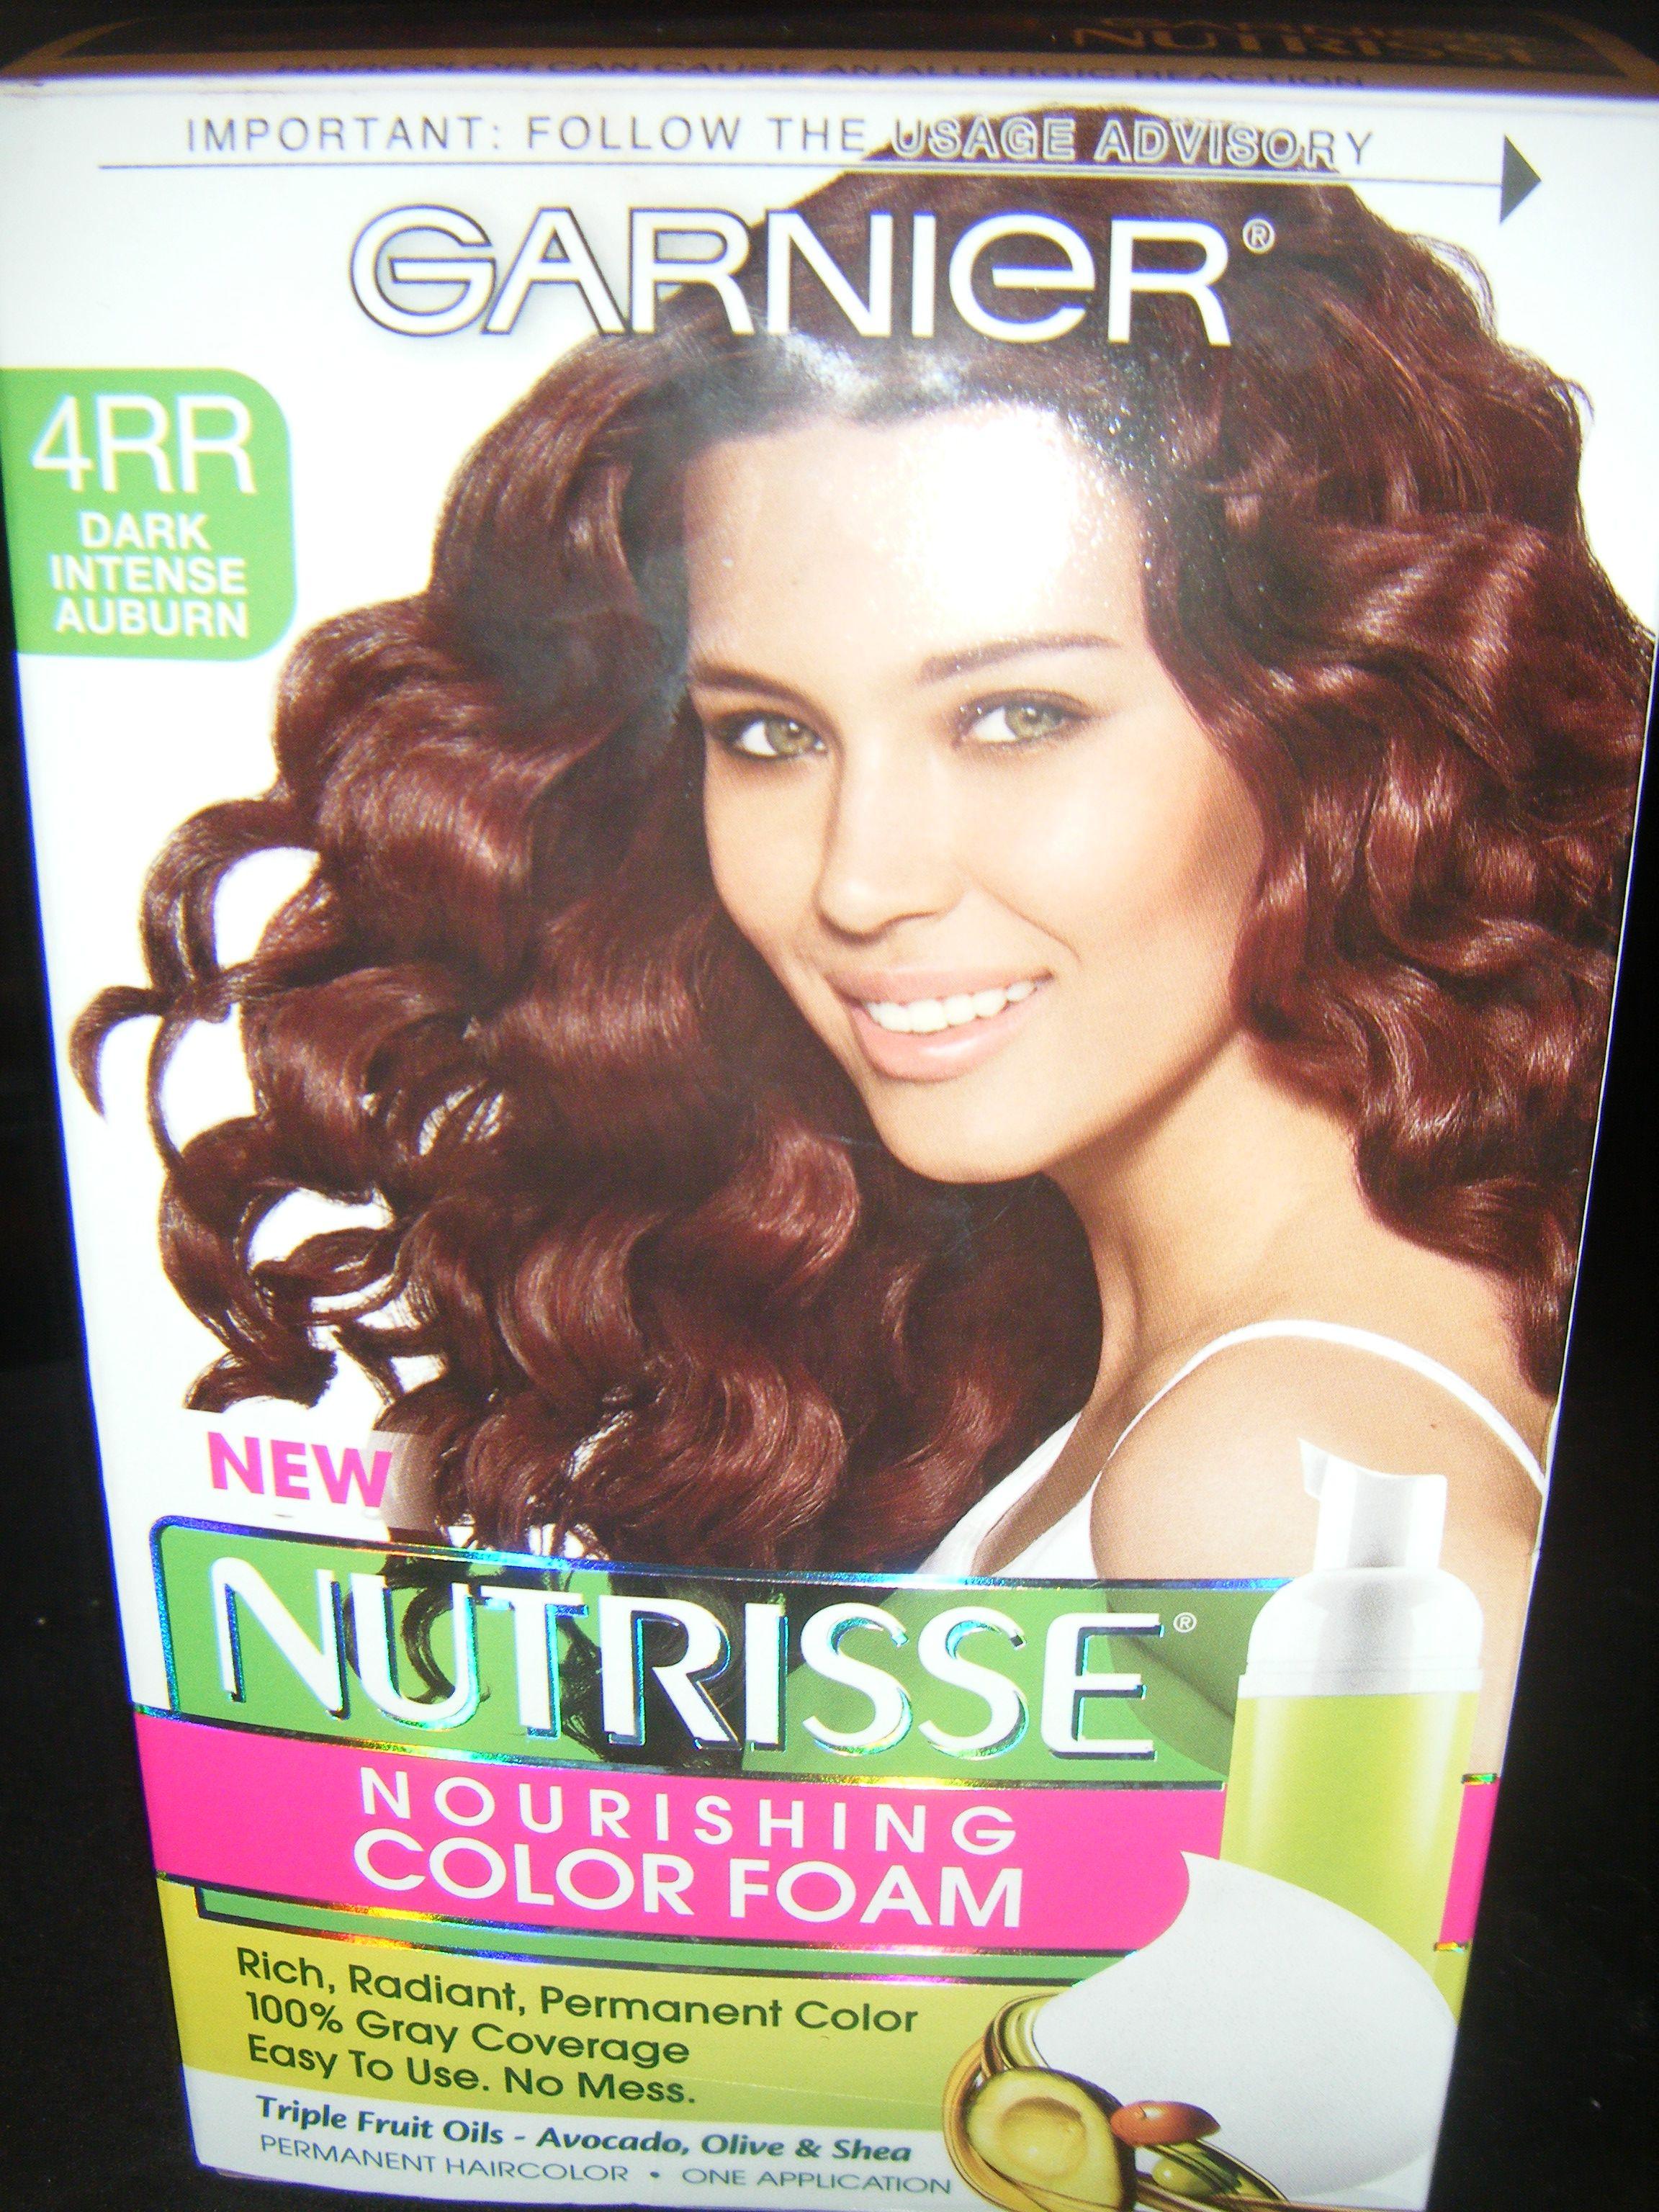 Garnier Nutrisse Nourishing Foam Color 4rr Dark Intense Auburn